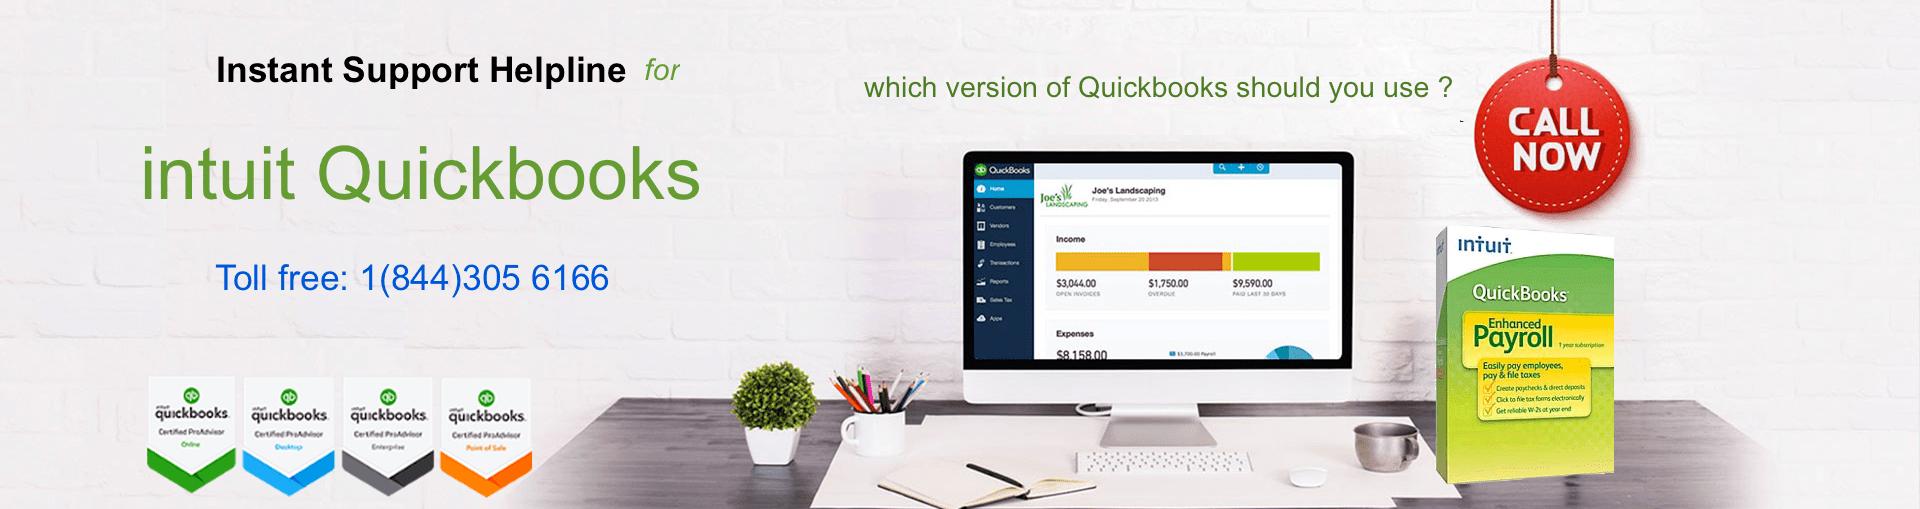 Quickbooks payroll support phone